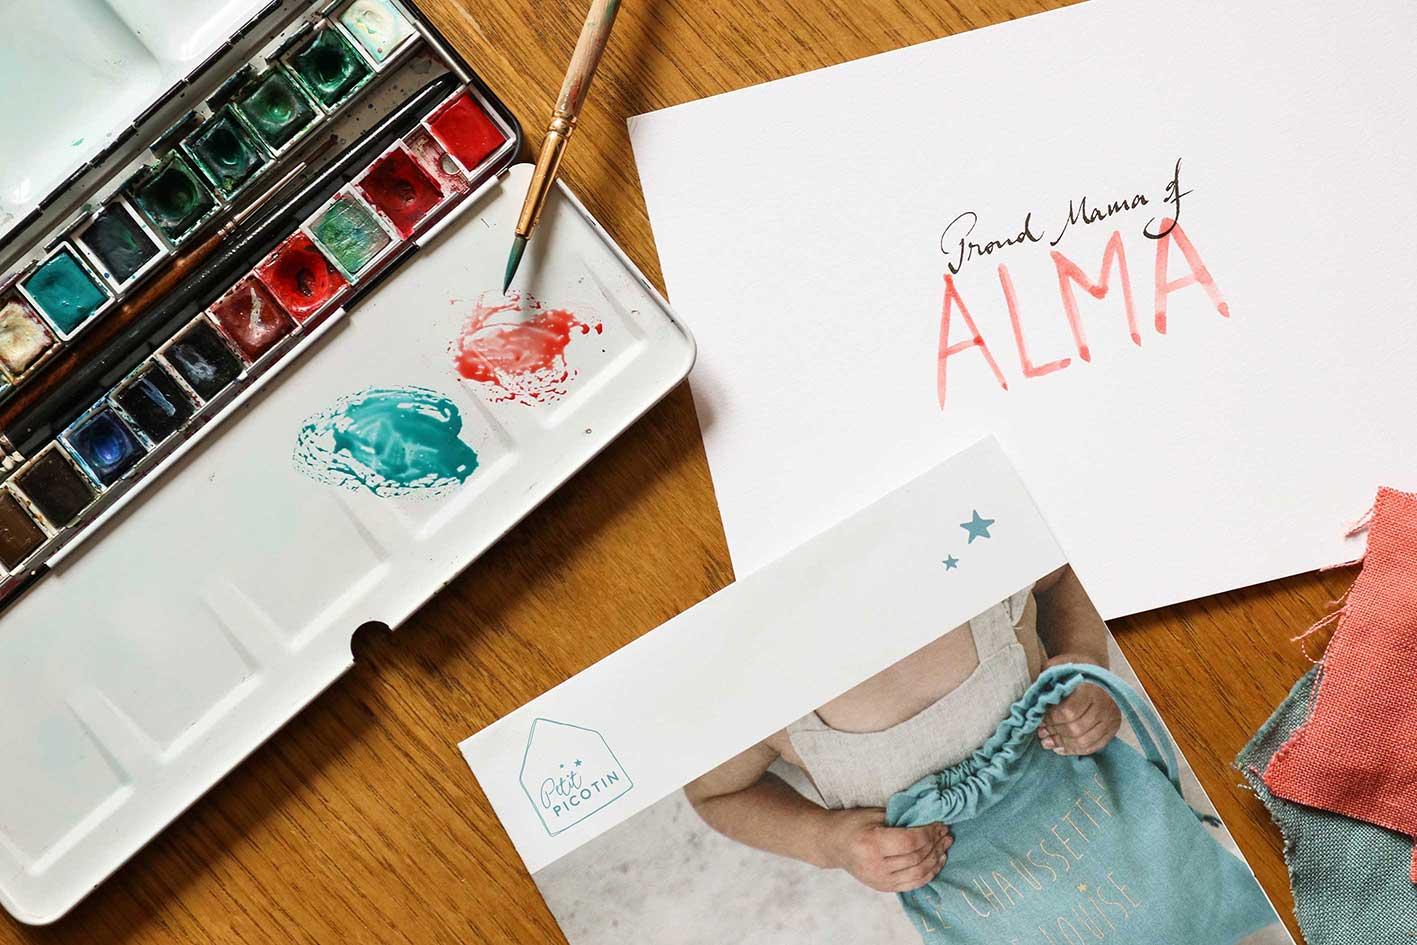 Ralanto-studio-calligraphie-collaboration-petit-picotin-prenom-alma.jpg